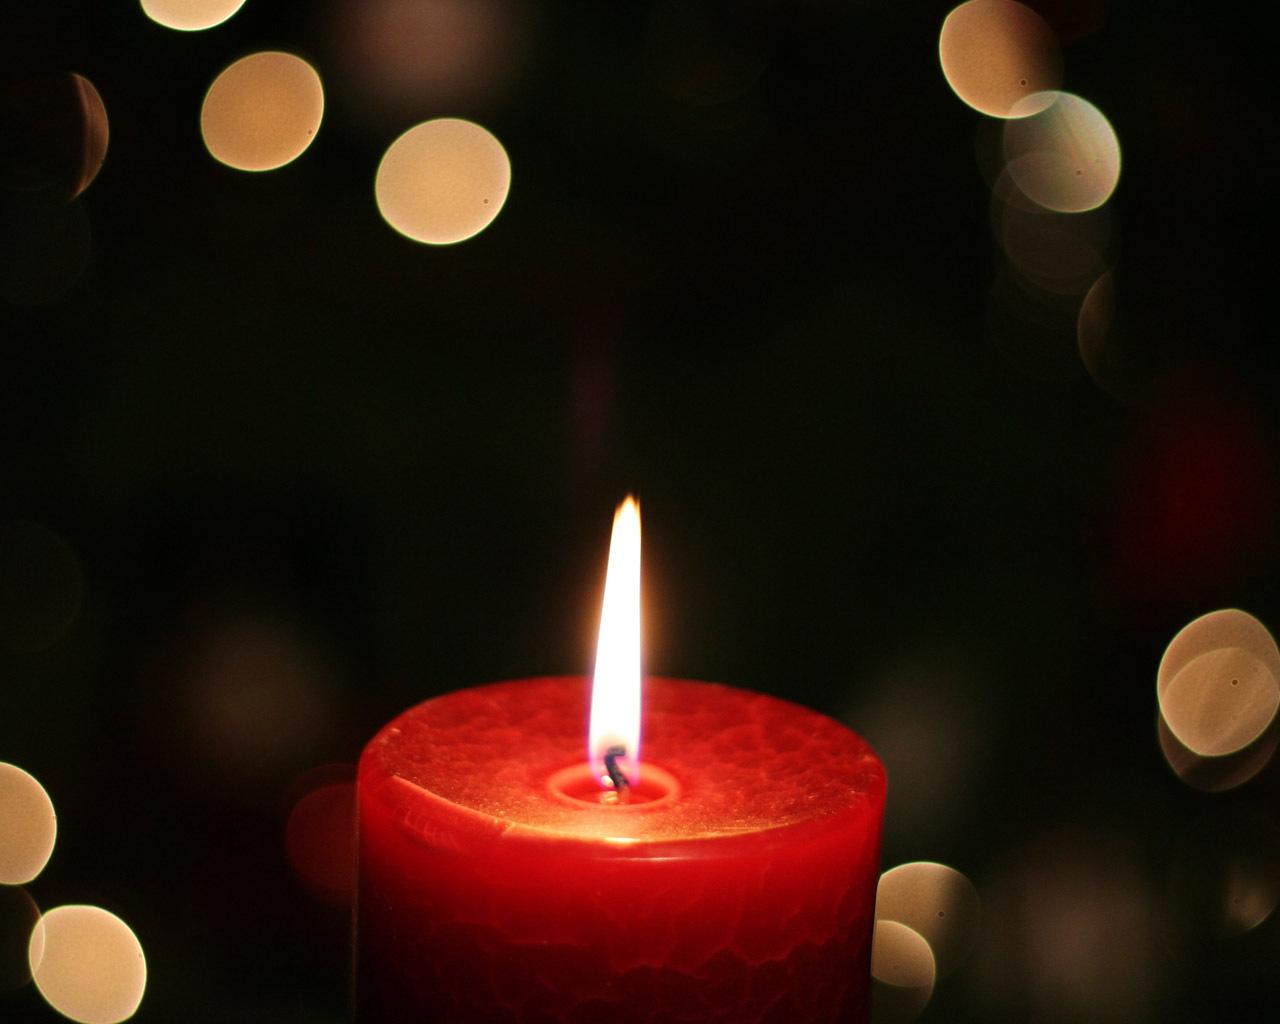 Candle wallpaper   Candles Wallpaper 4091313 1280x1024